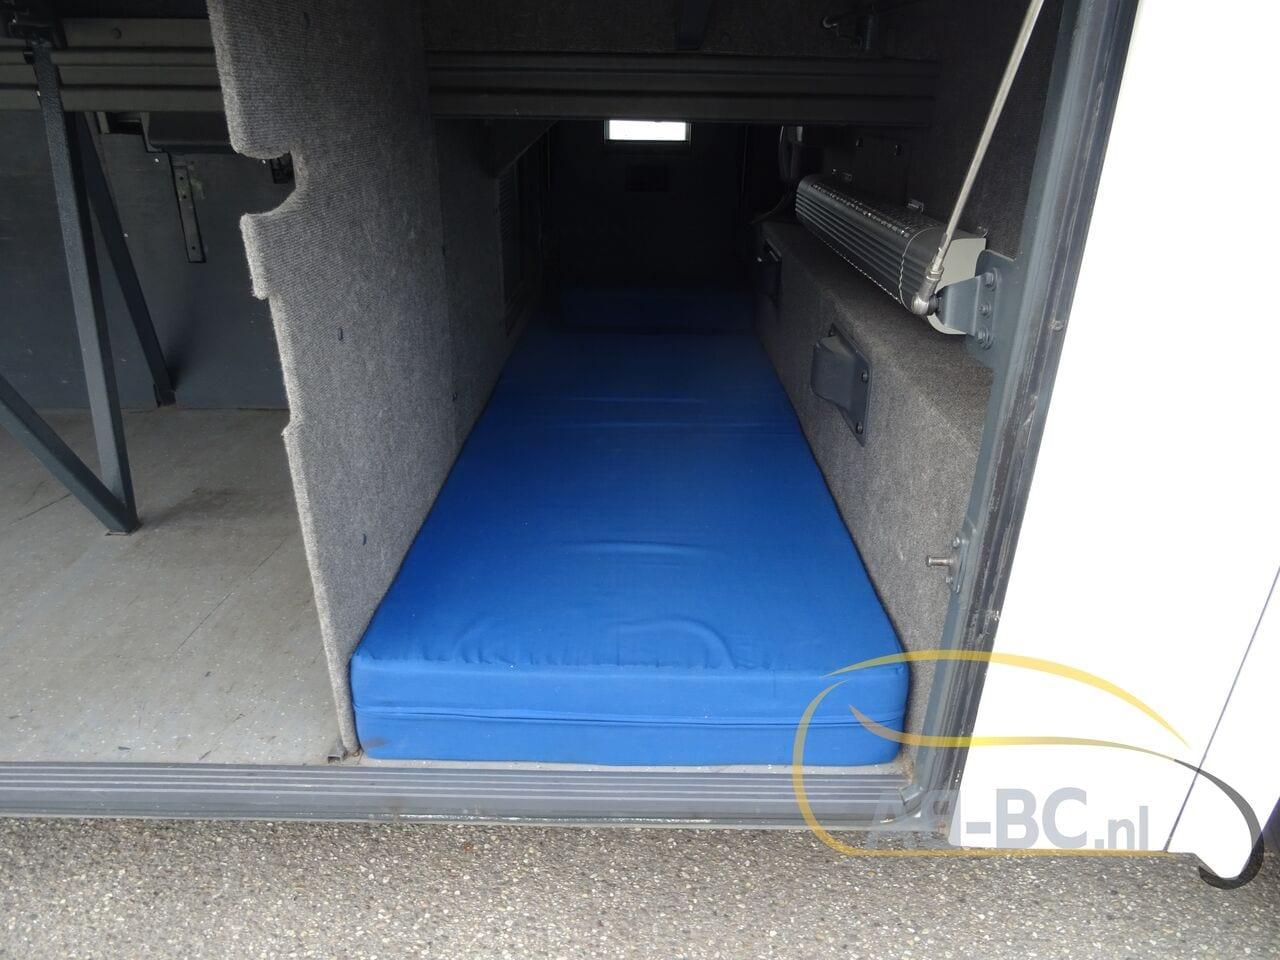 coach-busTEMSA-Safari-HD-51-Seats-EURO5-12-MTR---1614266419004510348_big_abdcfc304028988e1a2afaacf339b7b2--19052917224730818200